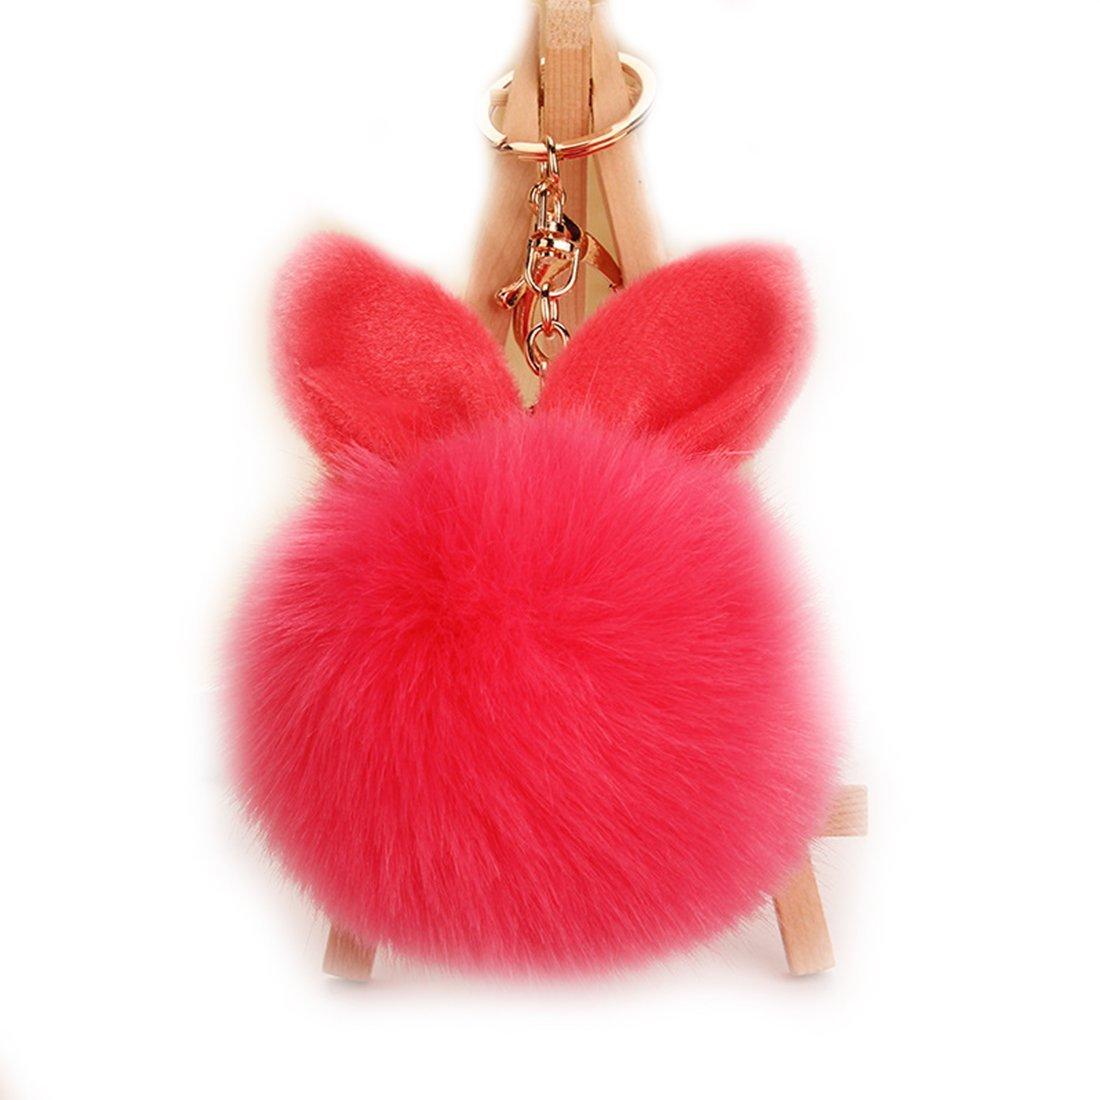 2a27e2ad48 URSFUR Rabbit Fur Ball Keychain Soft Ears Key Chain Ring Hook Phone Bag  Pendant at Amazon Women s Clothing store